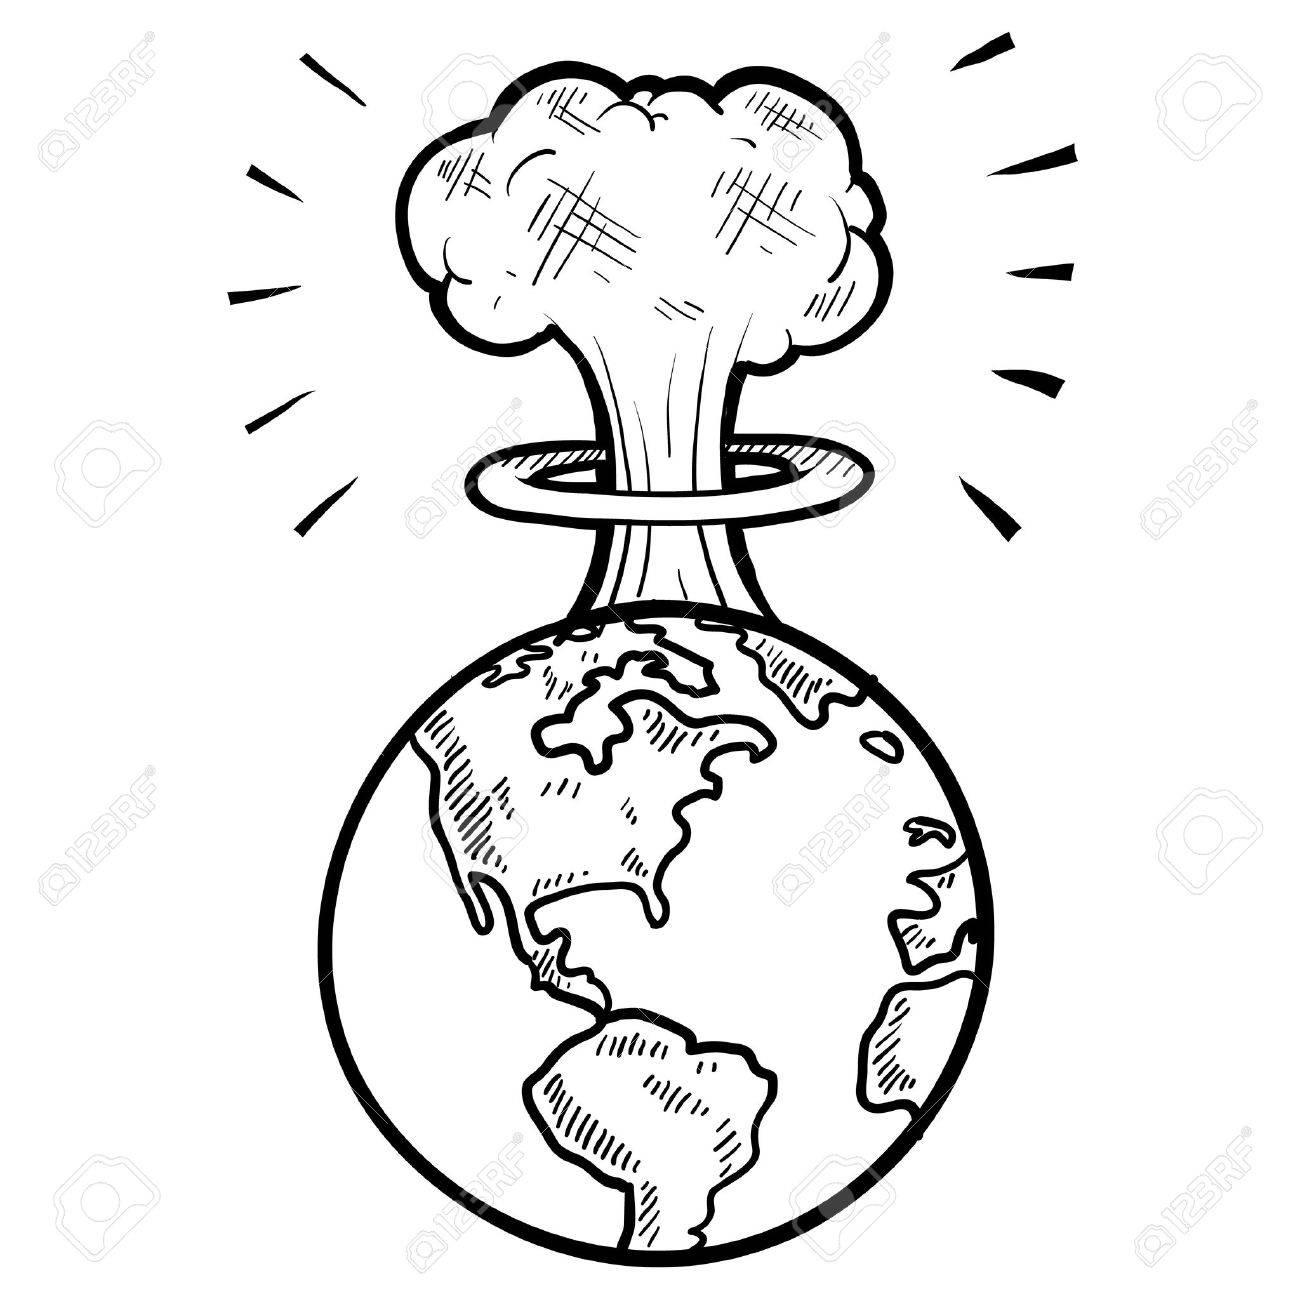 1300x1300 Doodle Style Global Apocalypse With Mushroom Cloud Sketch